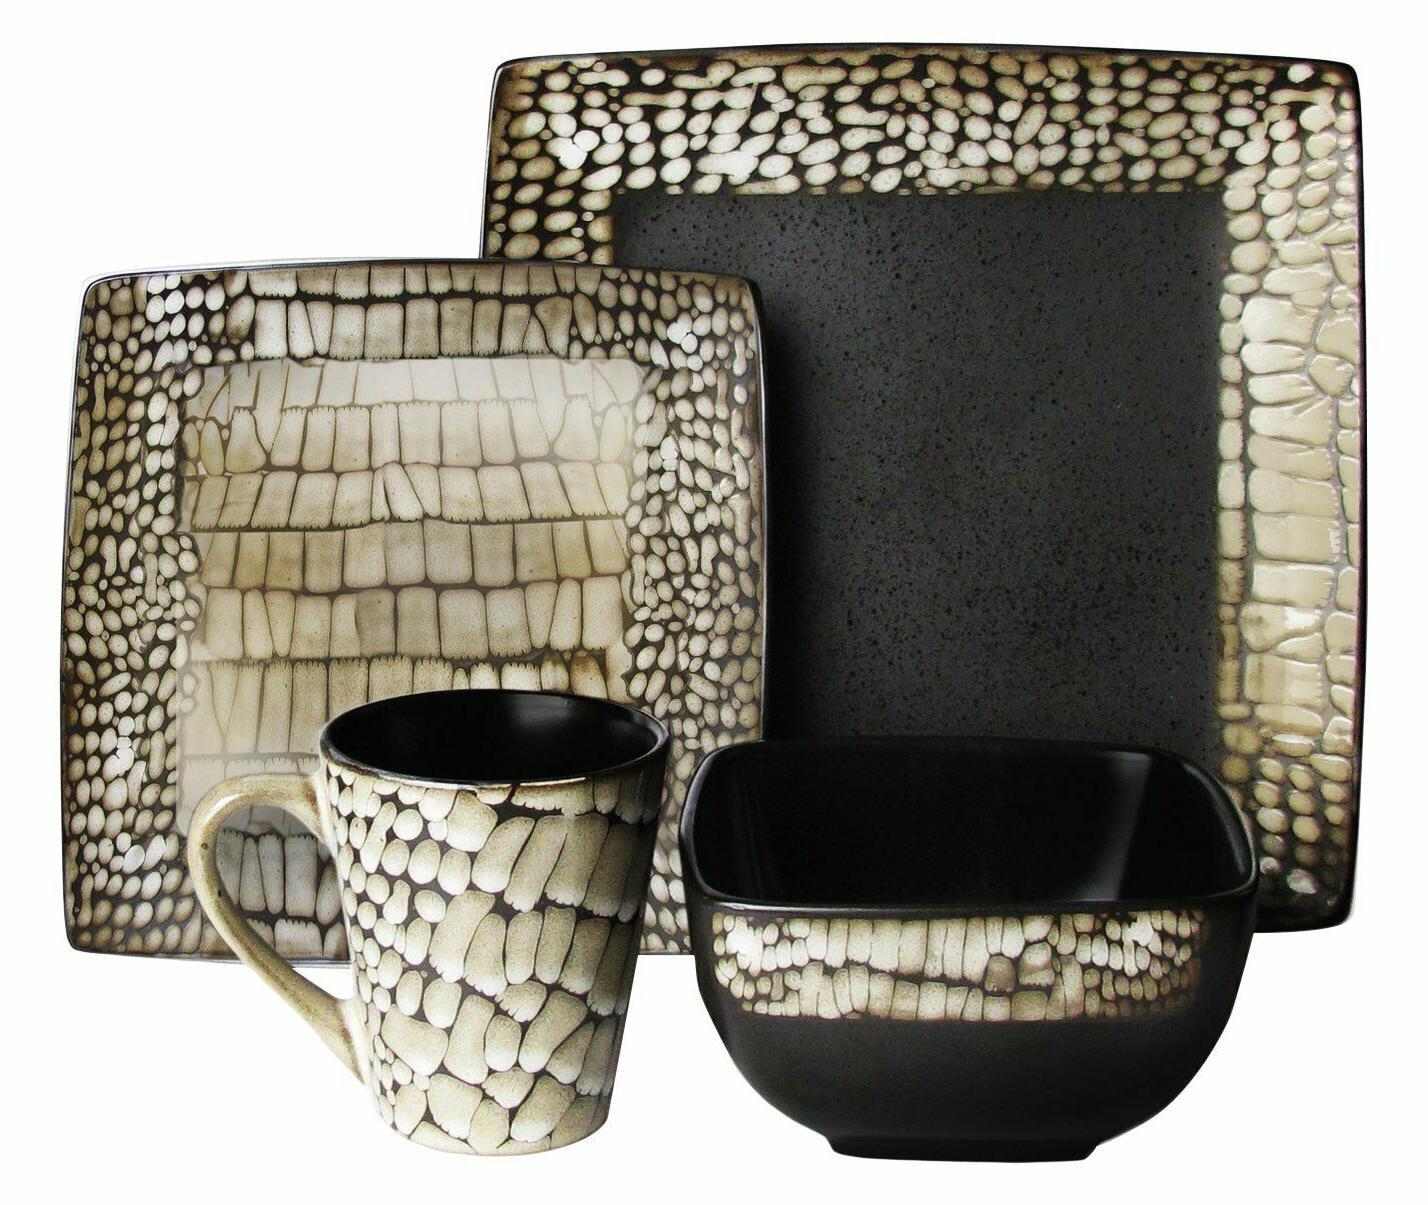 16pc Dinnerware Set Black White Boa Print Plate Bowl Mug Squ